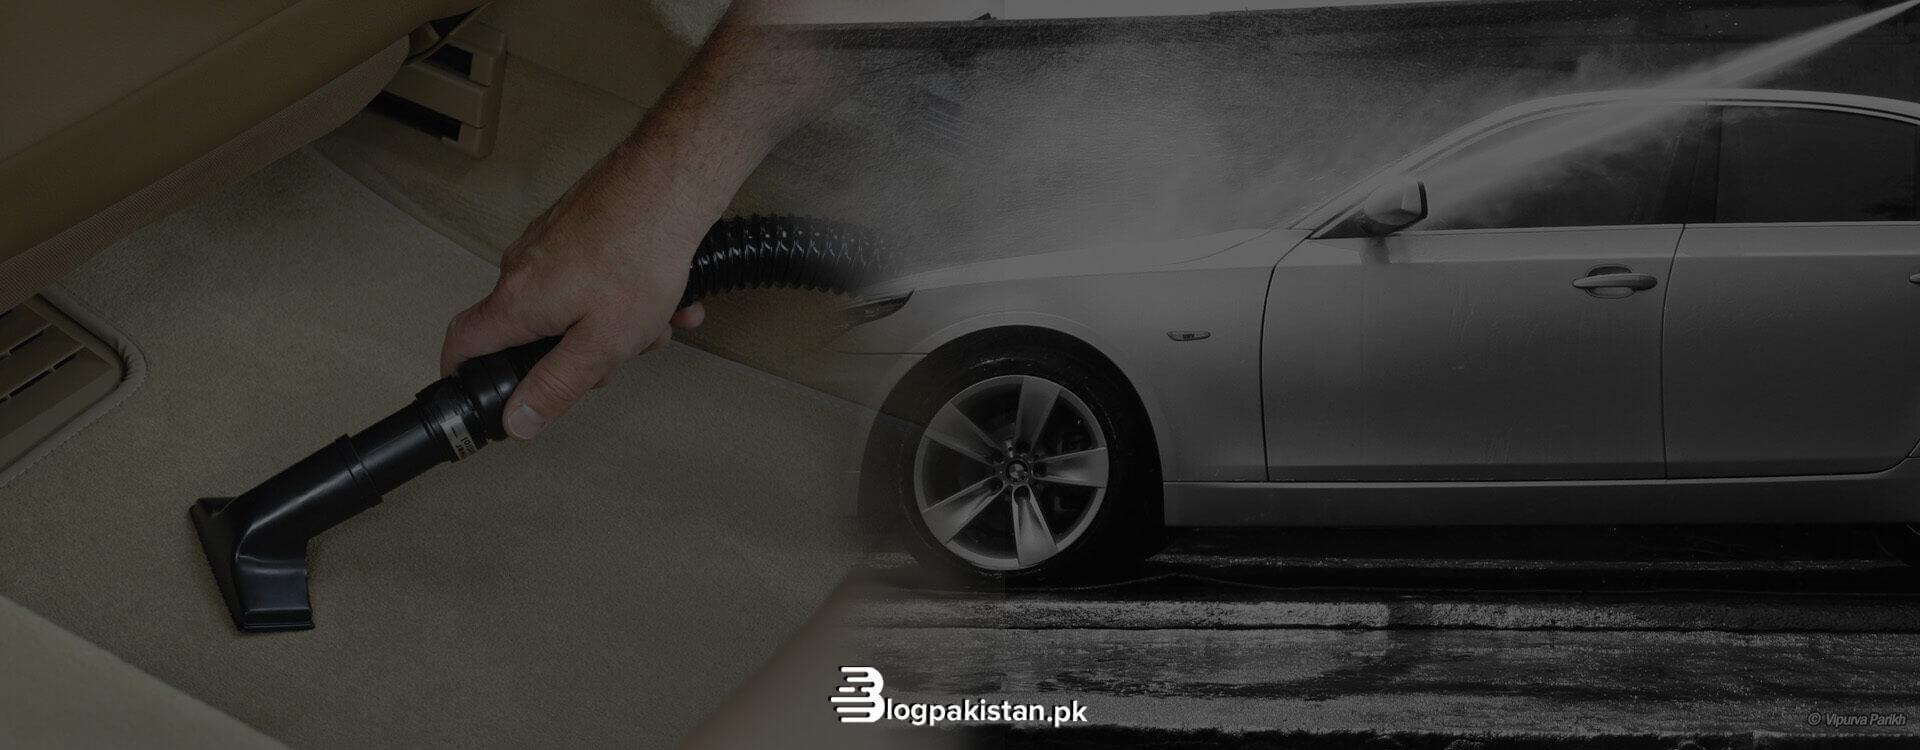 car detailing in Islamabad